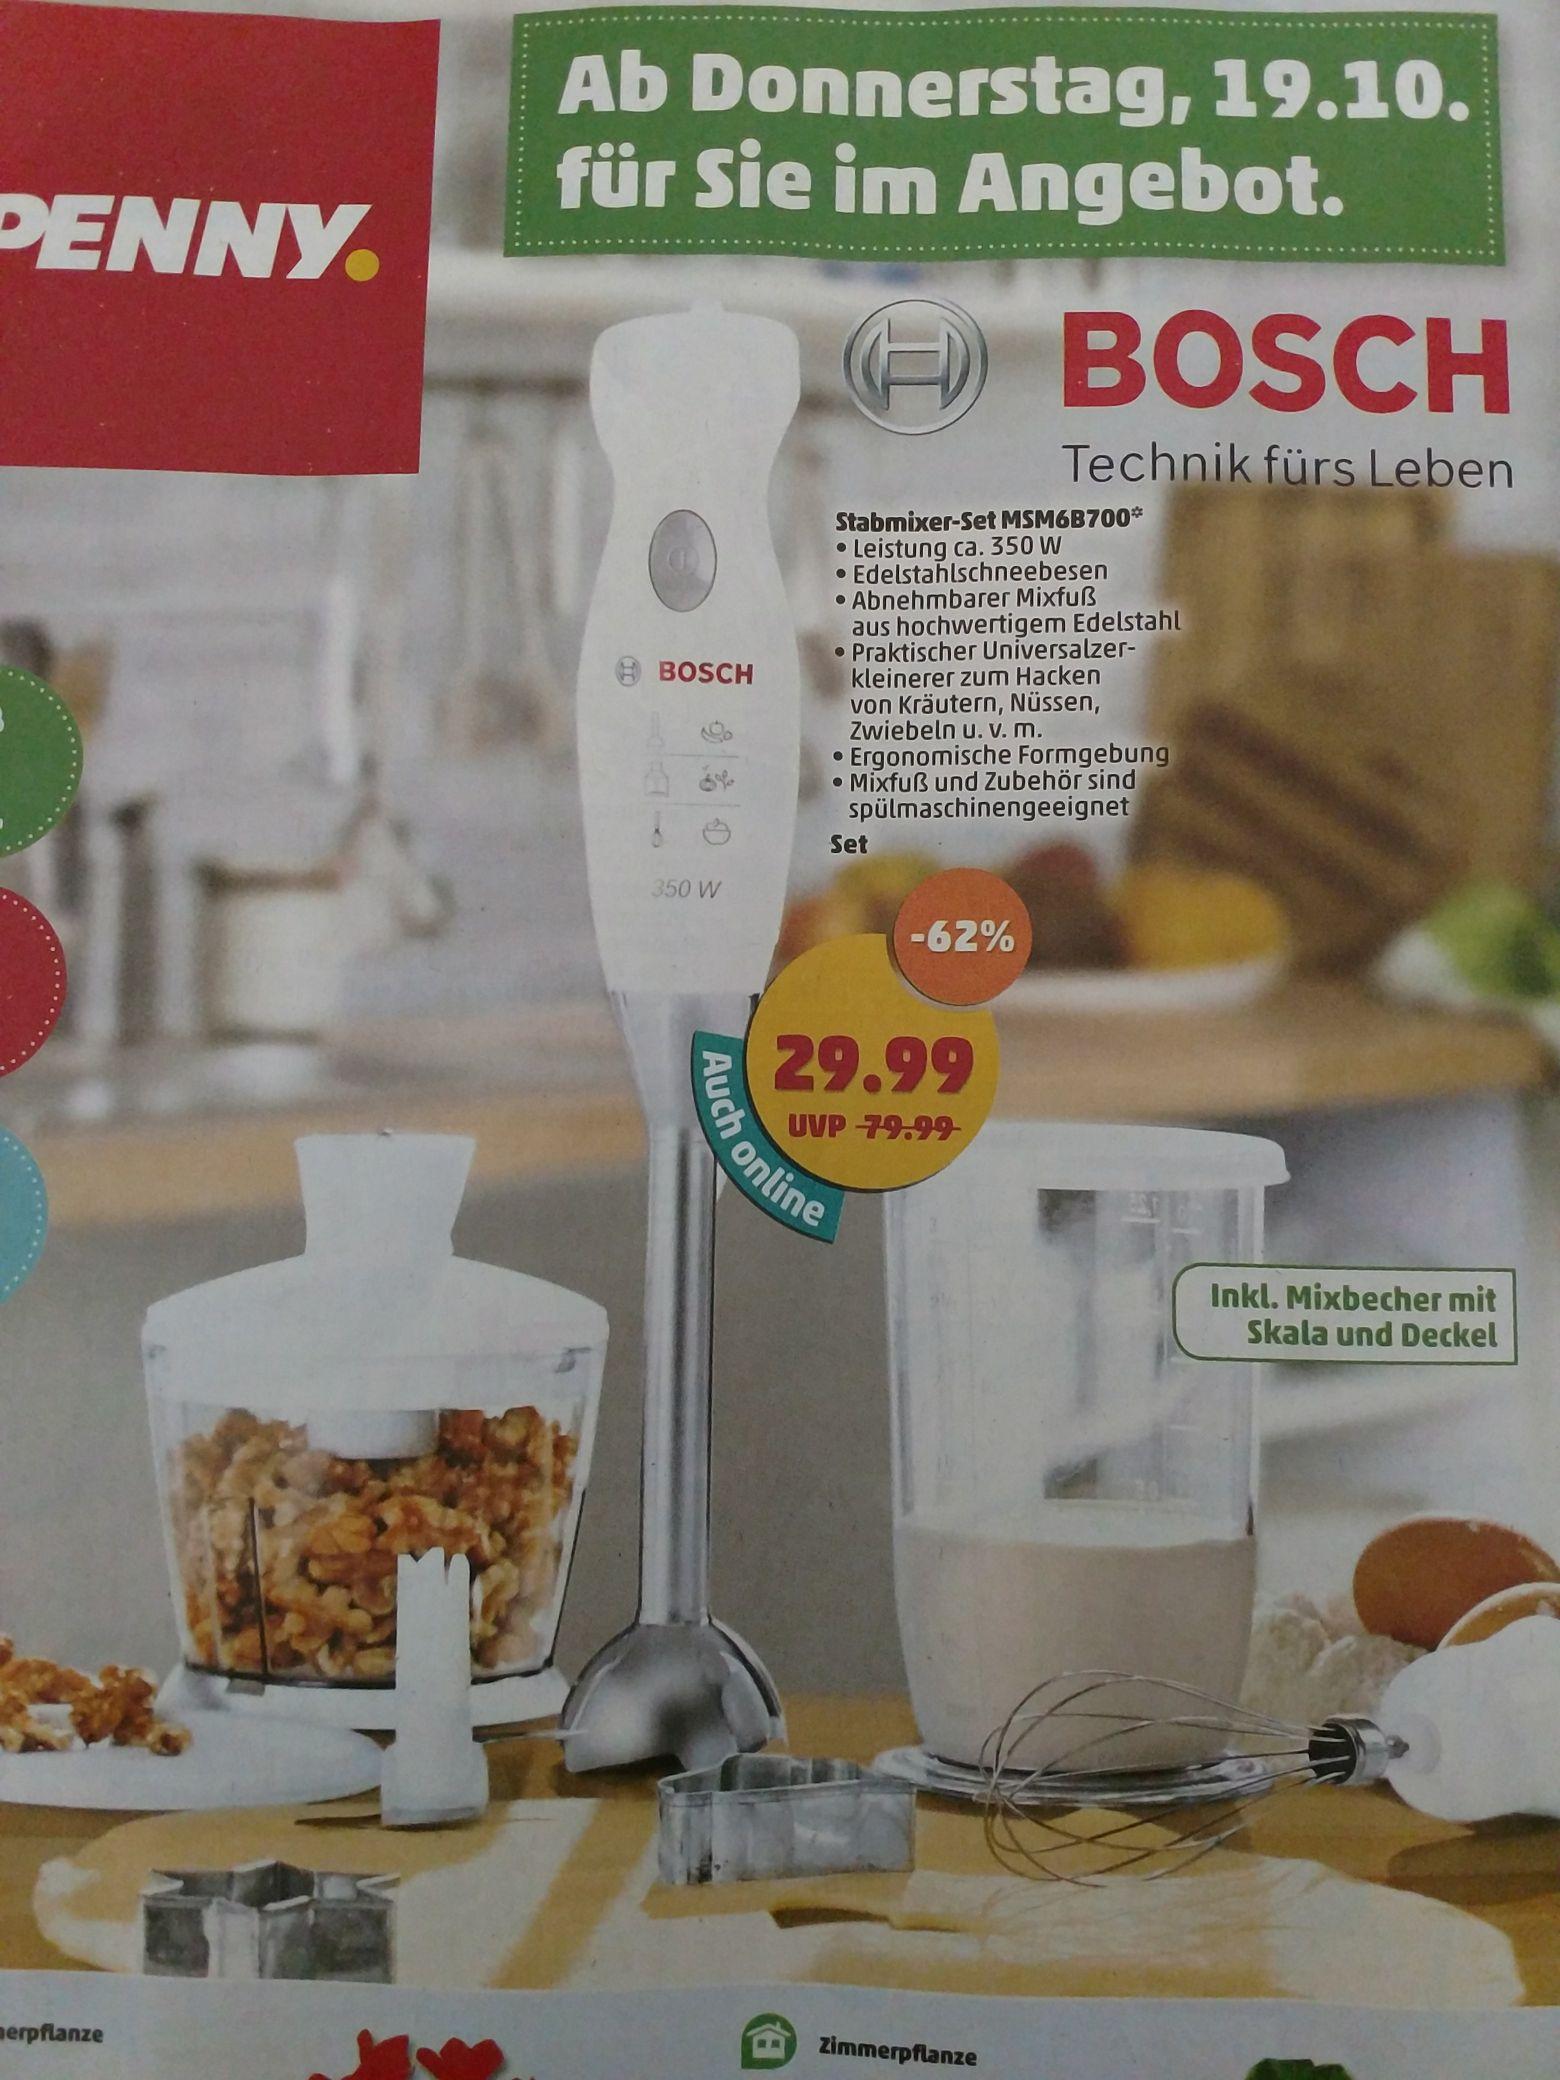 Bosch Stabmixer-Set MSM6B700 PENNY offline, online + 4,99 VSK ab 19.10.